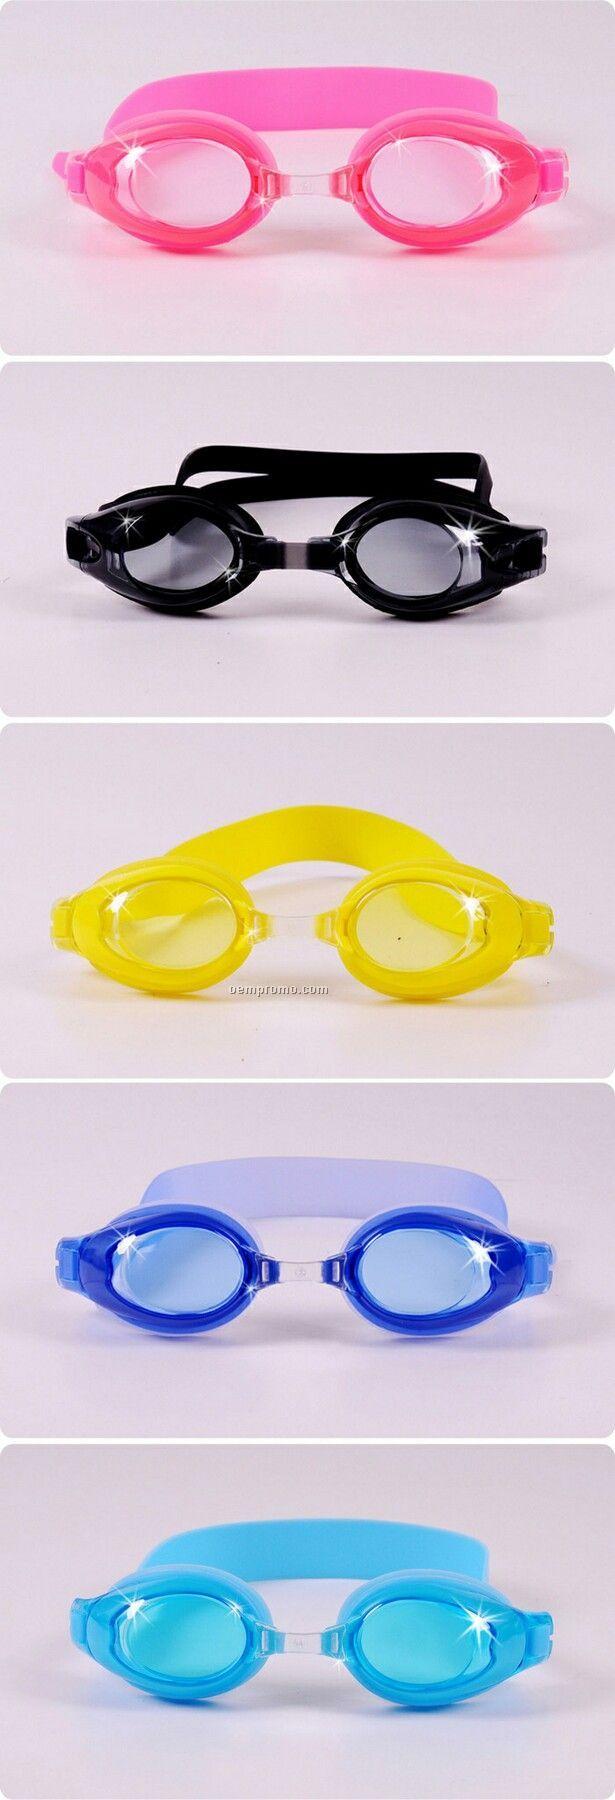 Plastic Goggles